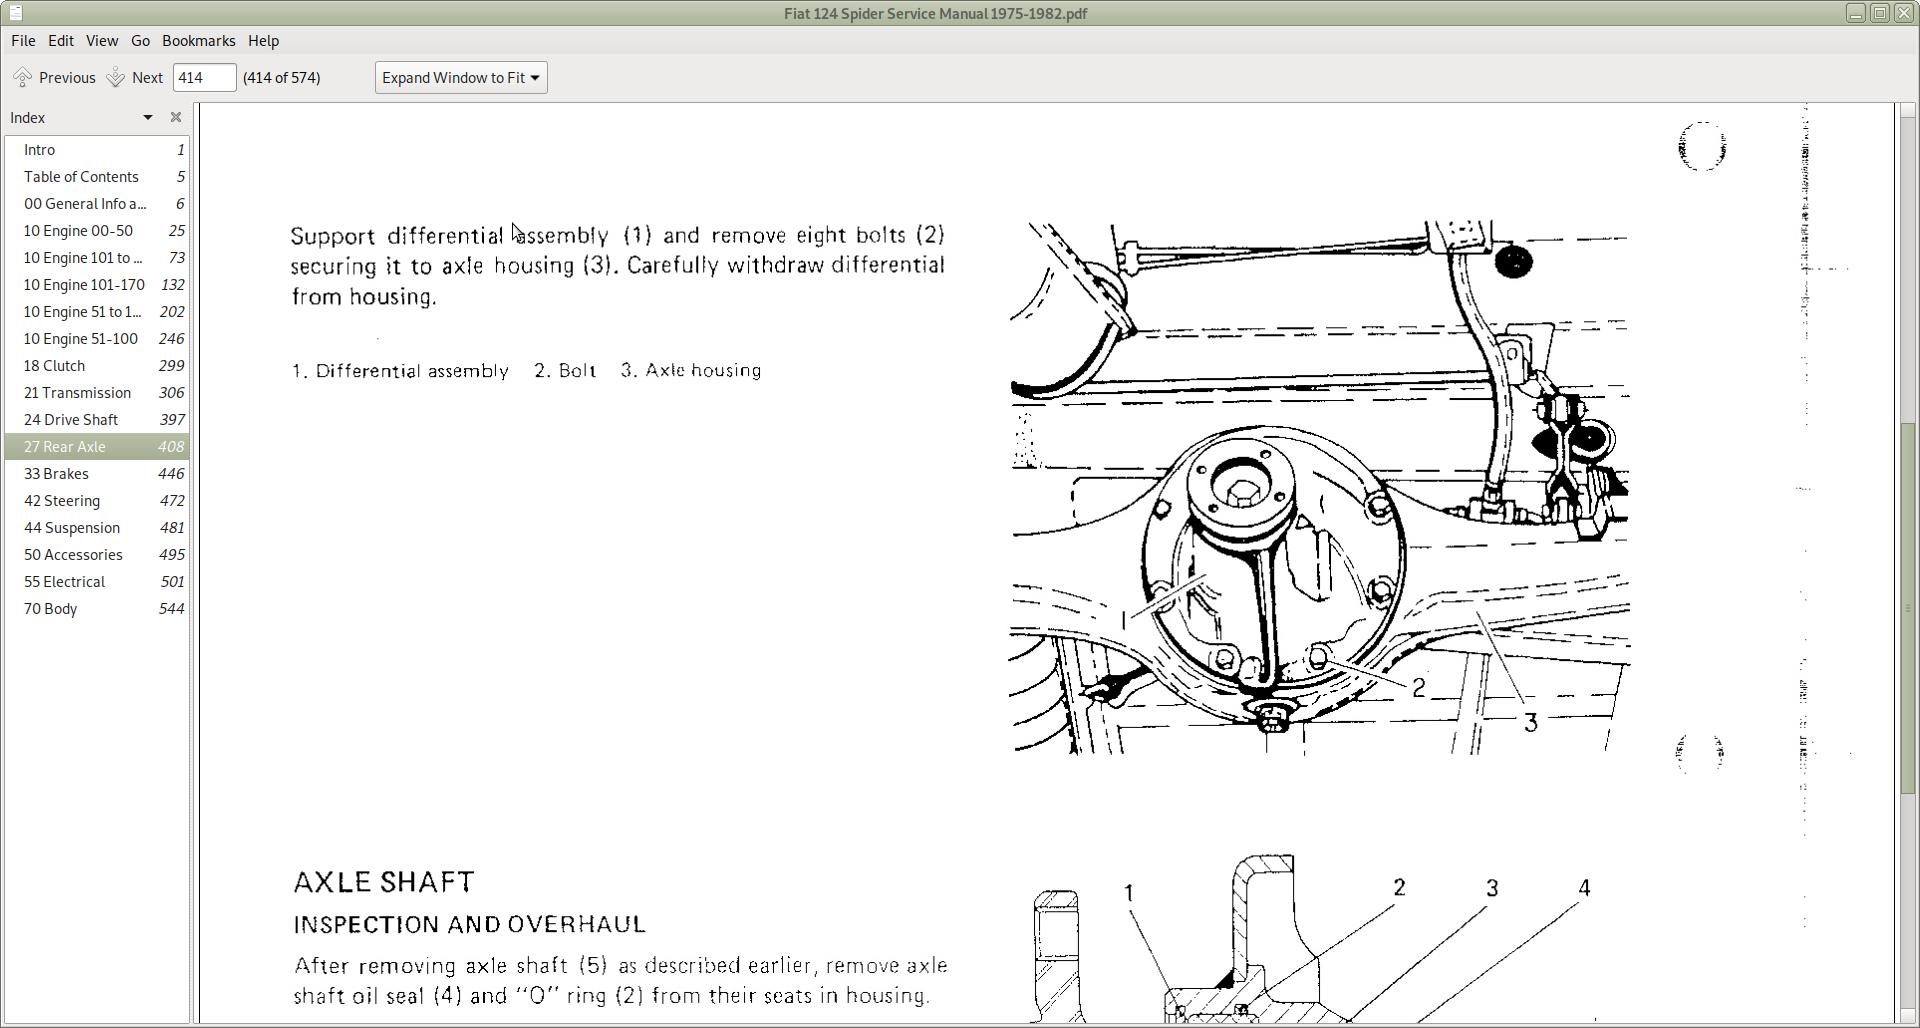 Fiat 124 Spider Models Repair Service Manual